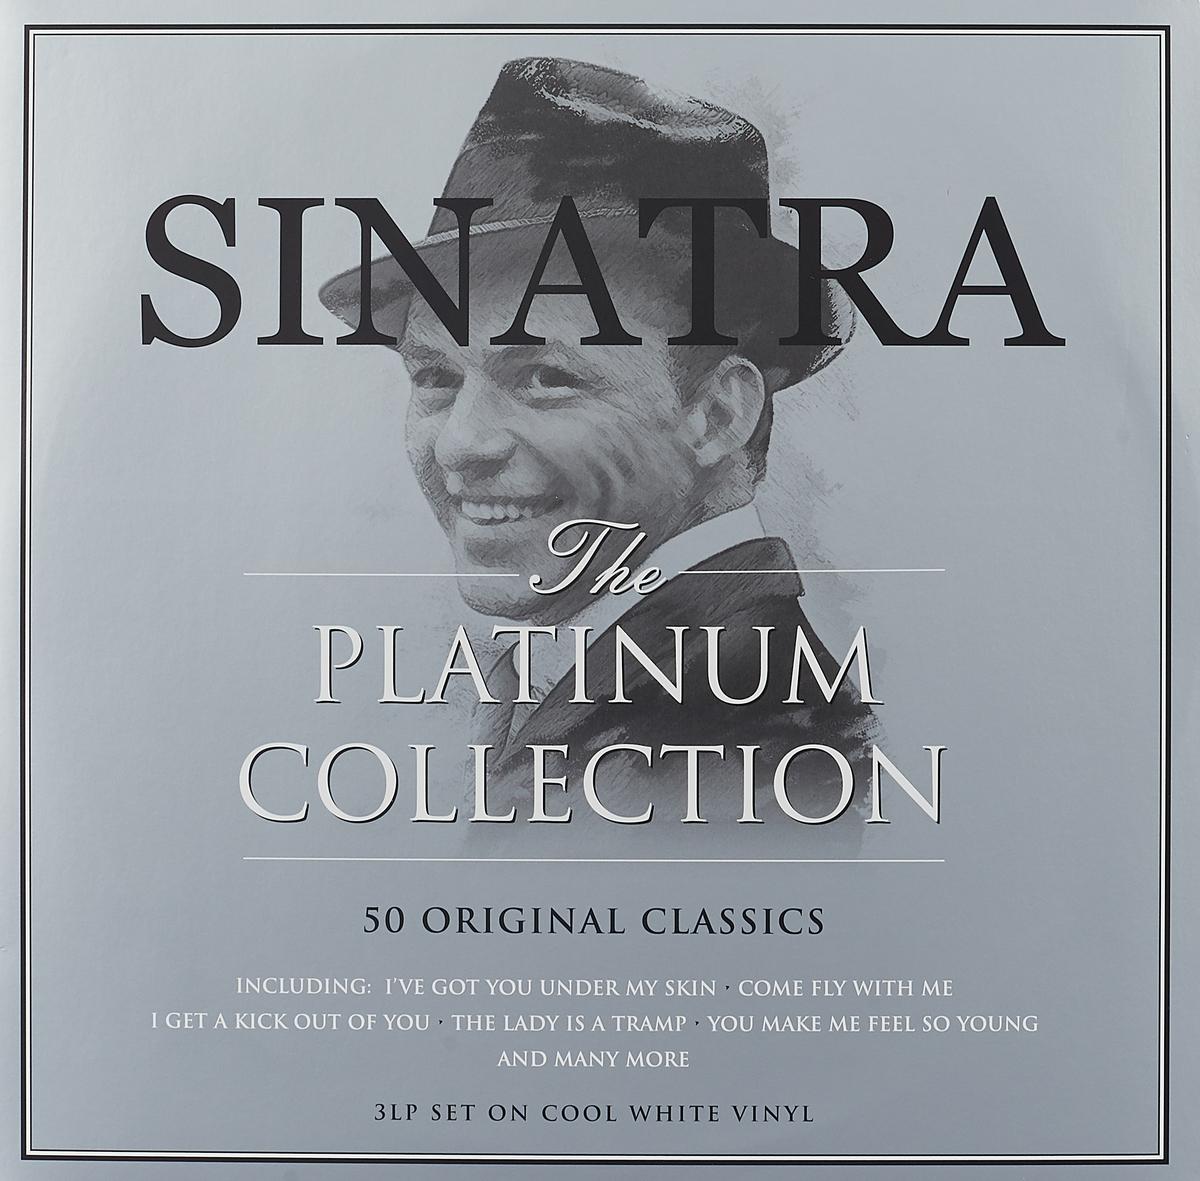 Фрэнк Синатра младший Frank Sinatra. The Platinum Collection (White Vinyl) (3 LP) custom papel de parede para sala sheet music murals for bedroom living room tv wall vinyl waterproof which wallpaper